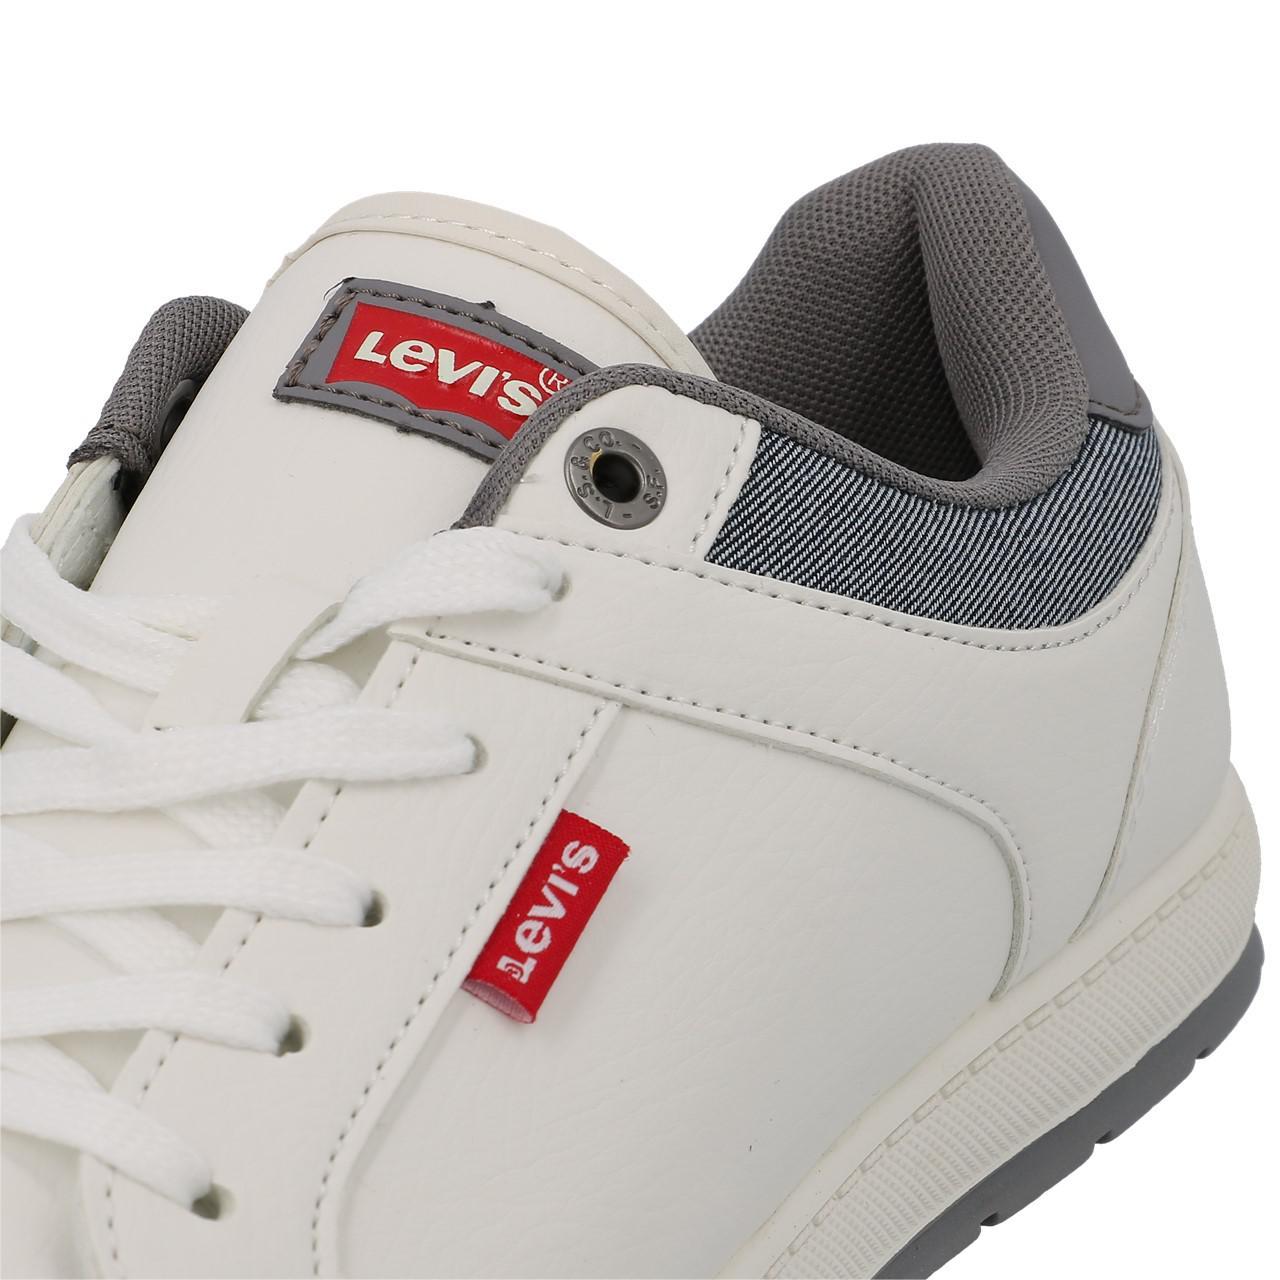 Chaussures-mode-ville-Levis-Declan-blanc-Blanc-53197-Neuf miniature 2